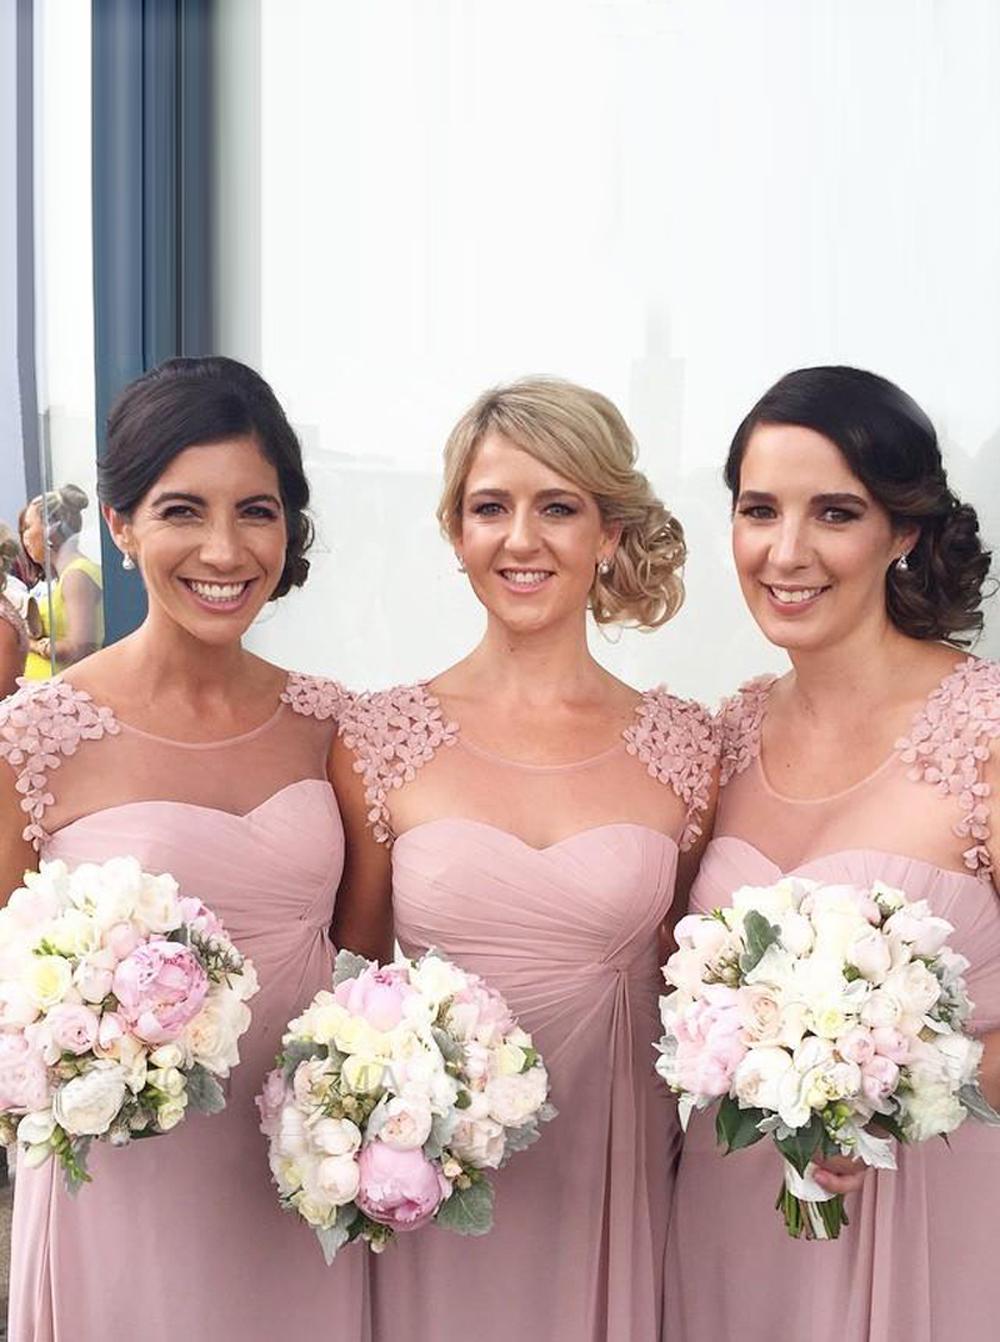 Elegant Scoop Cap Sleeves Floor-Length Bridesmaid Dress with Appliques Ruched фото